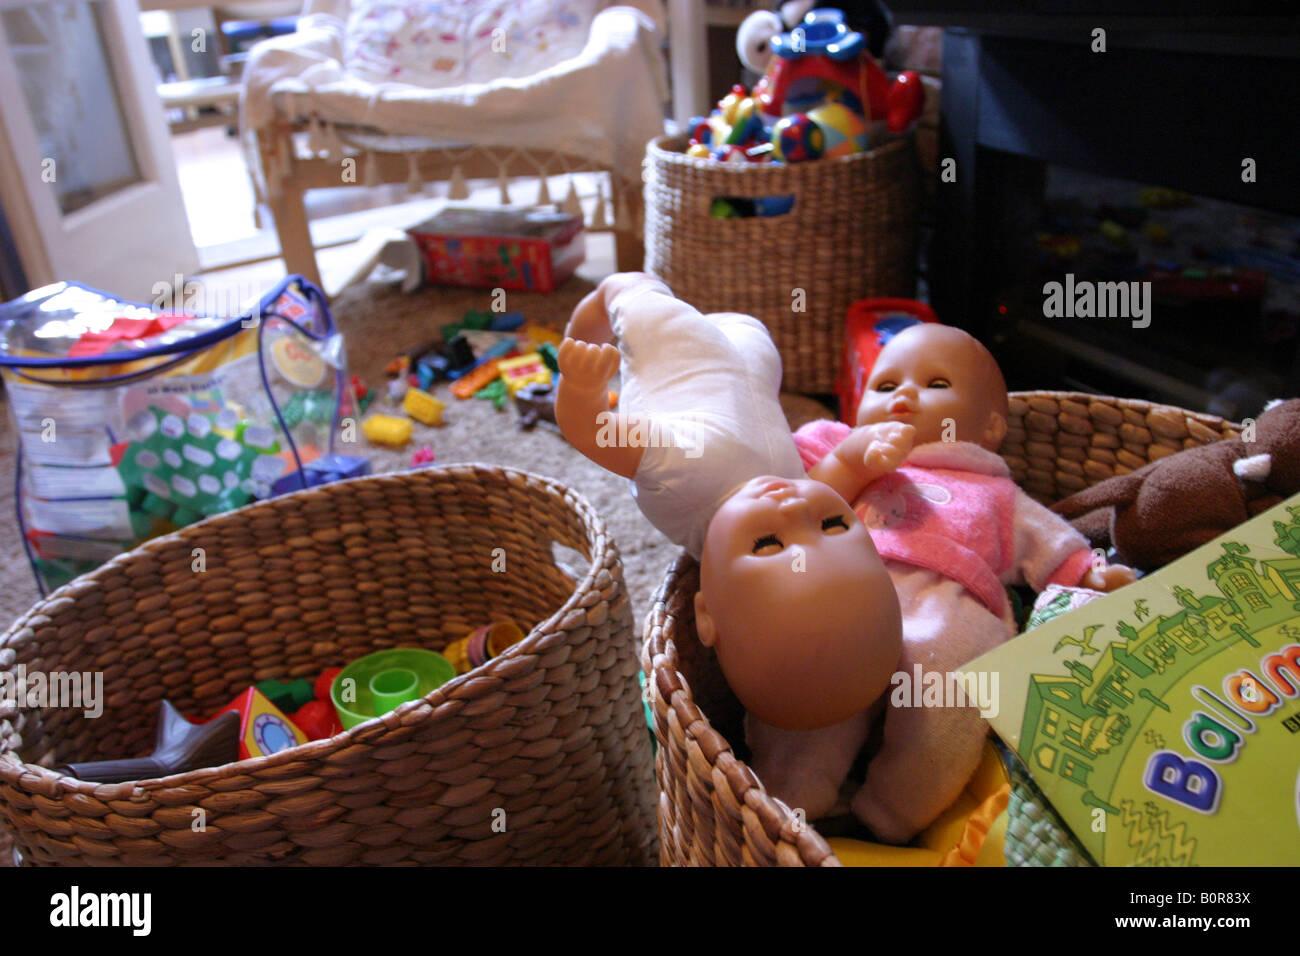 Kids Toys - Stock Image